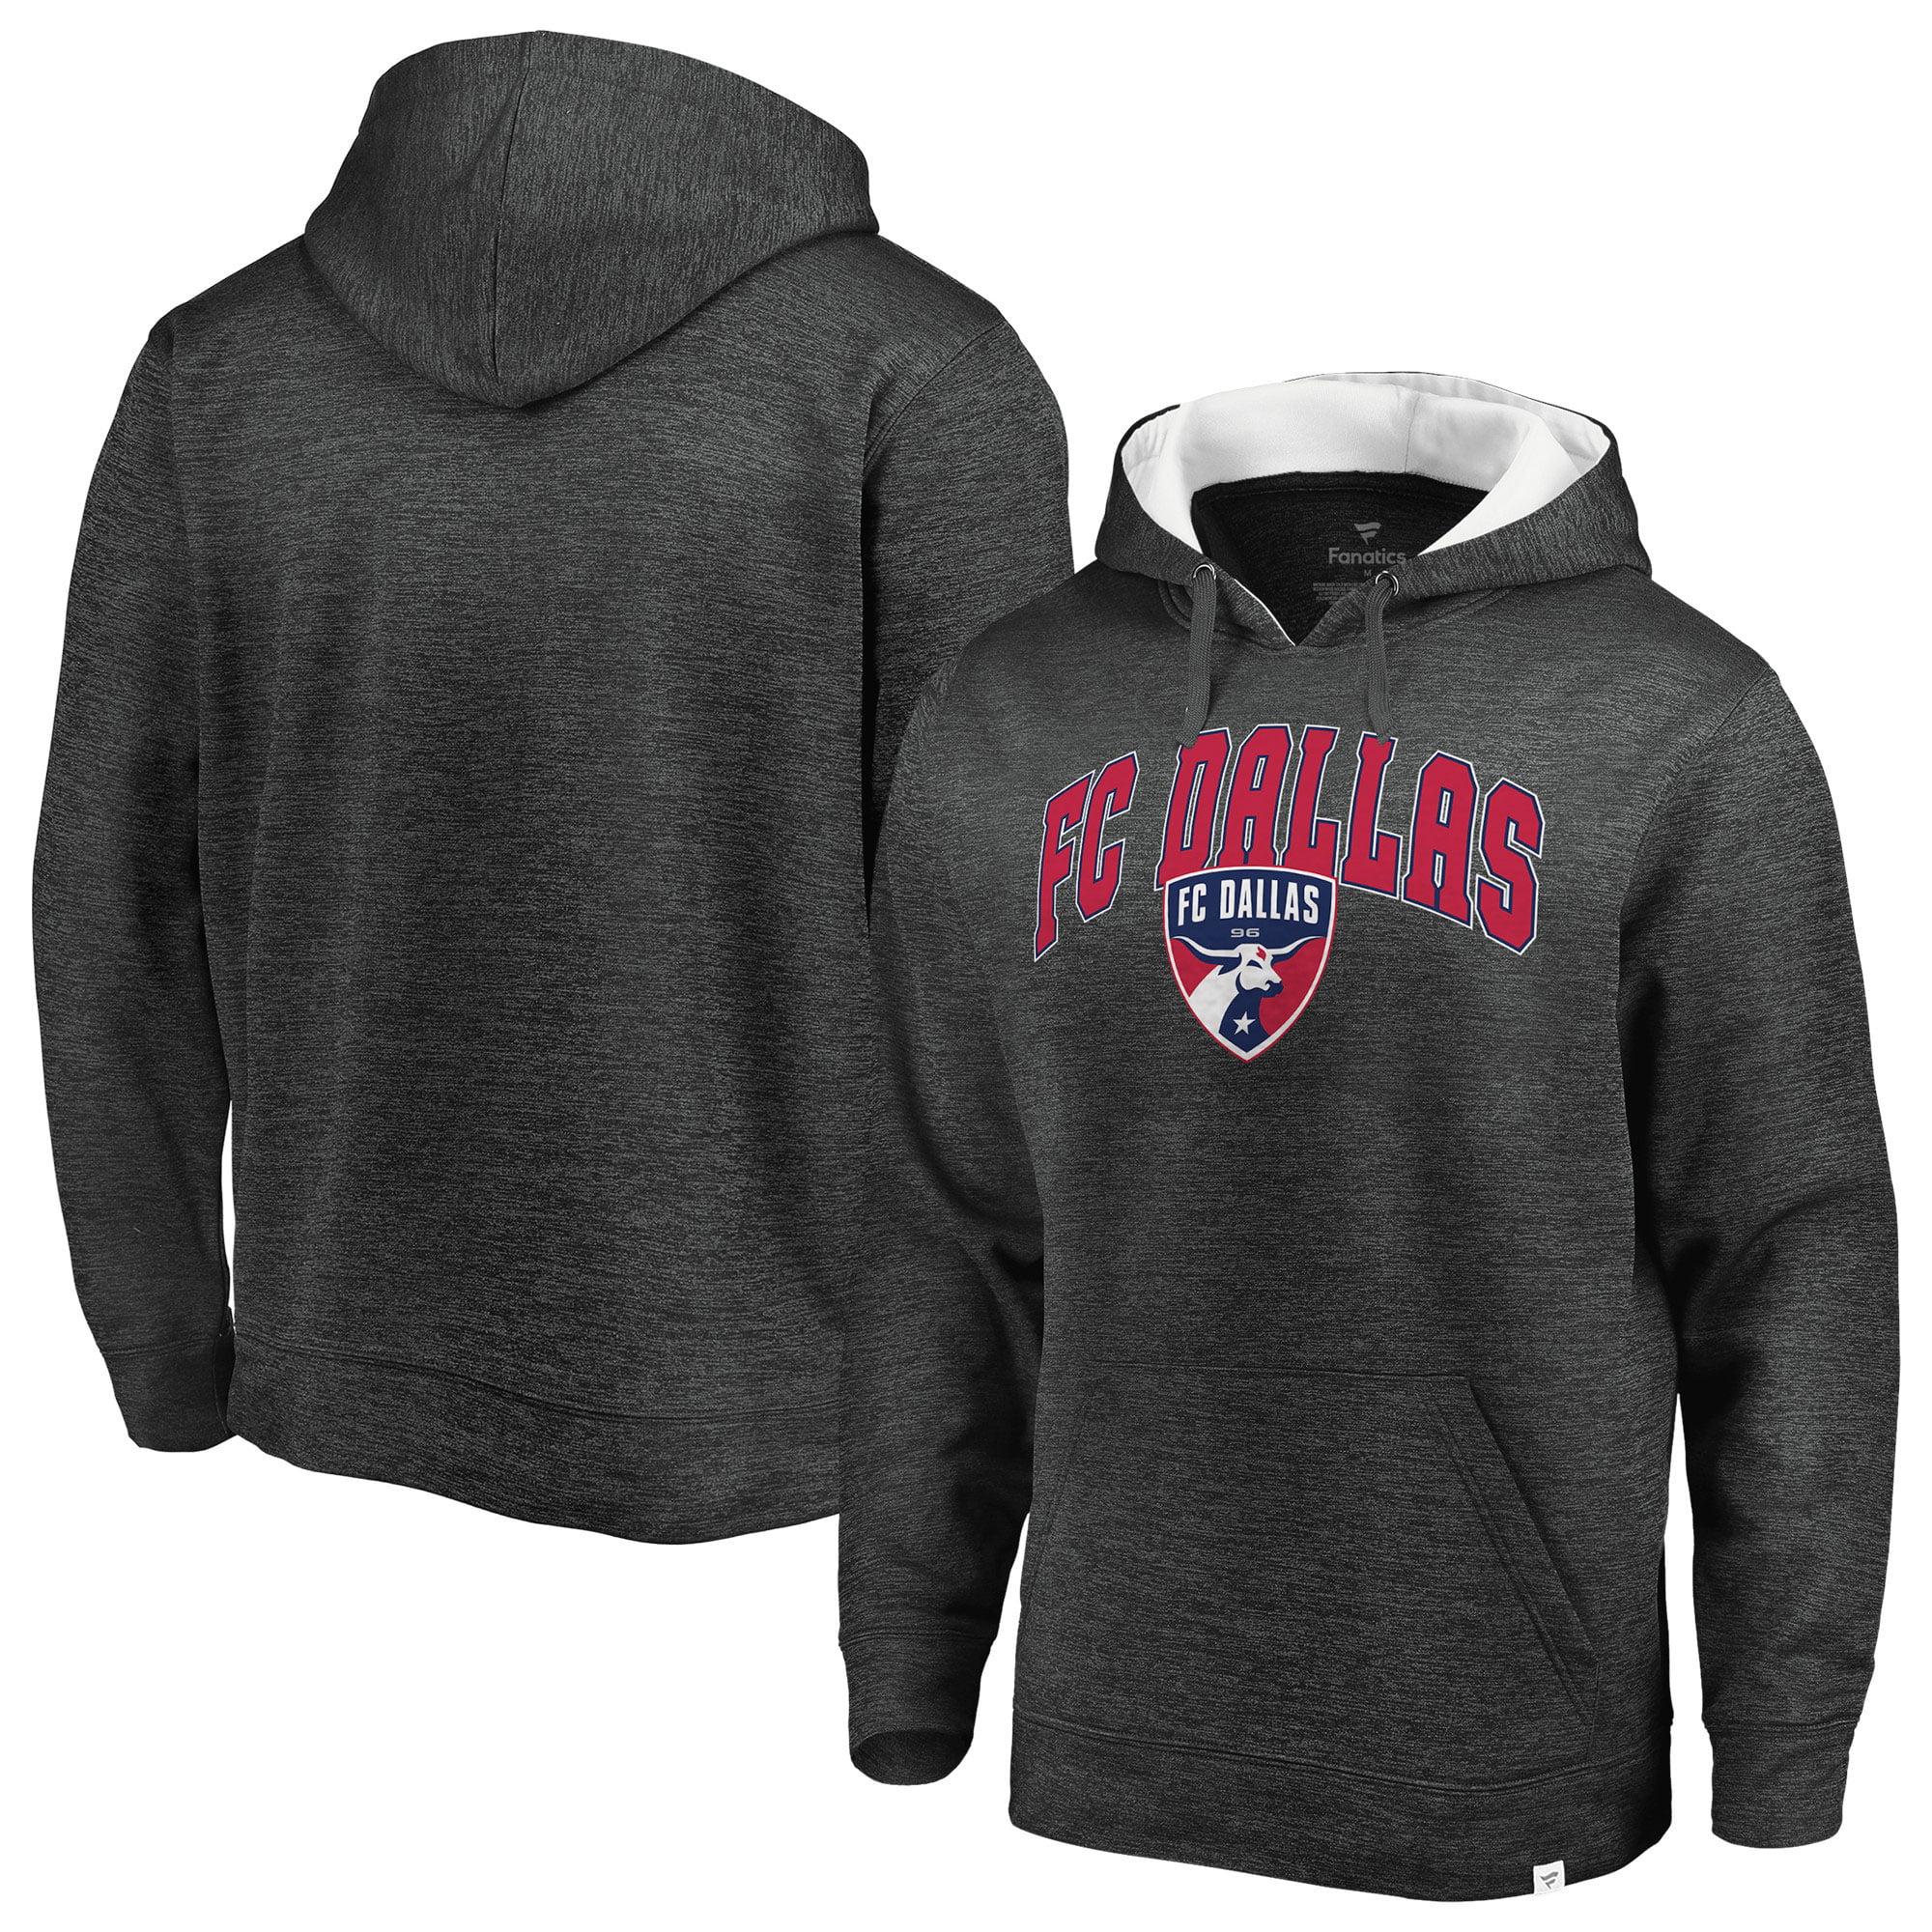 FC Dallas Fanatics Branded Pullover Hoodie - Heathered Gray